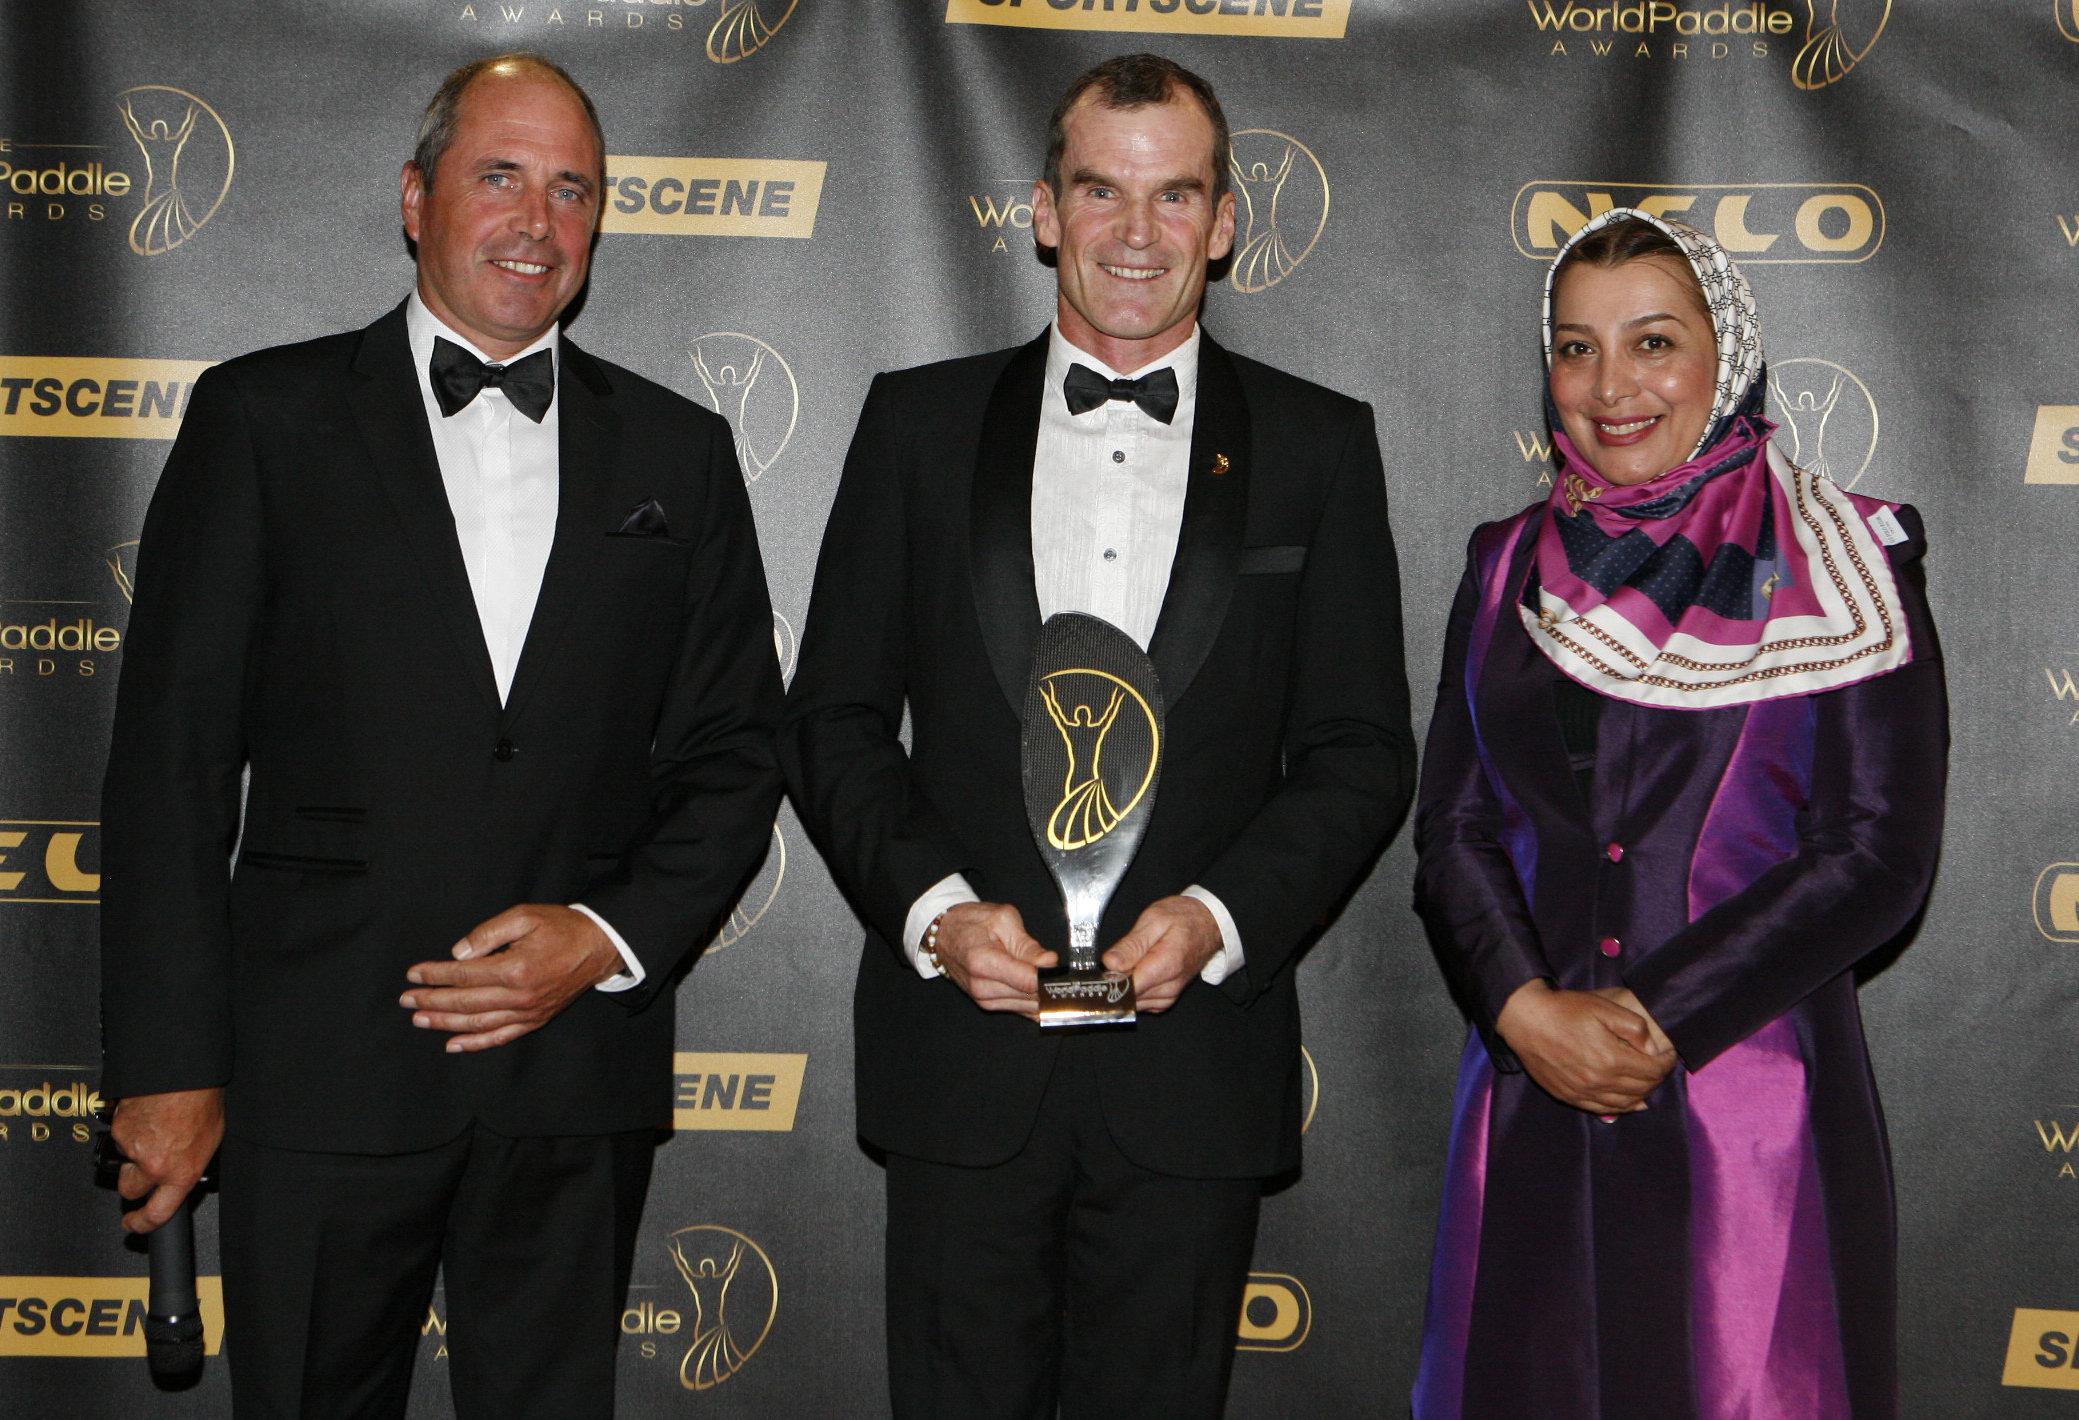 Dusi winner Dreyer rewarded for his work in local community